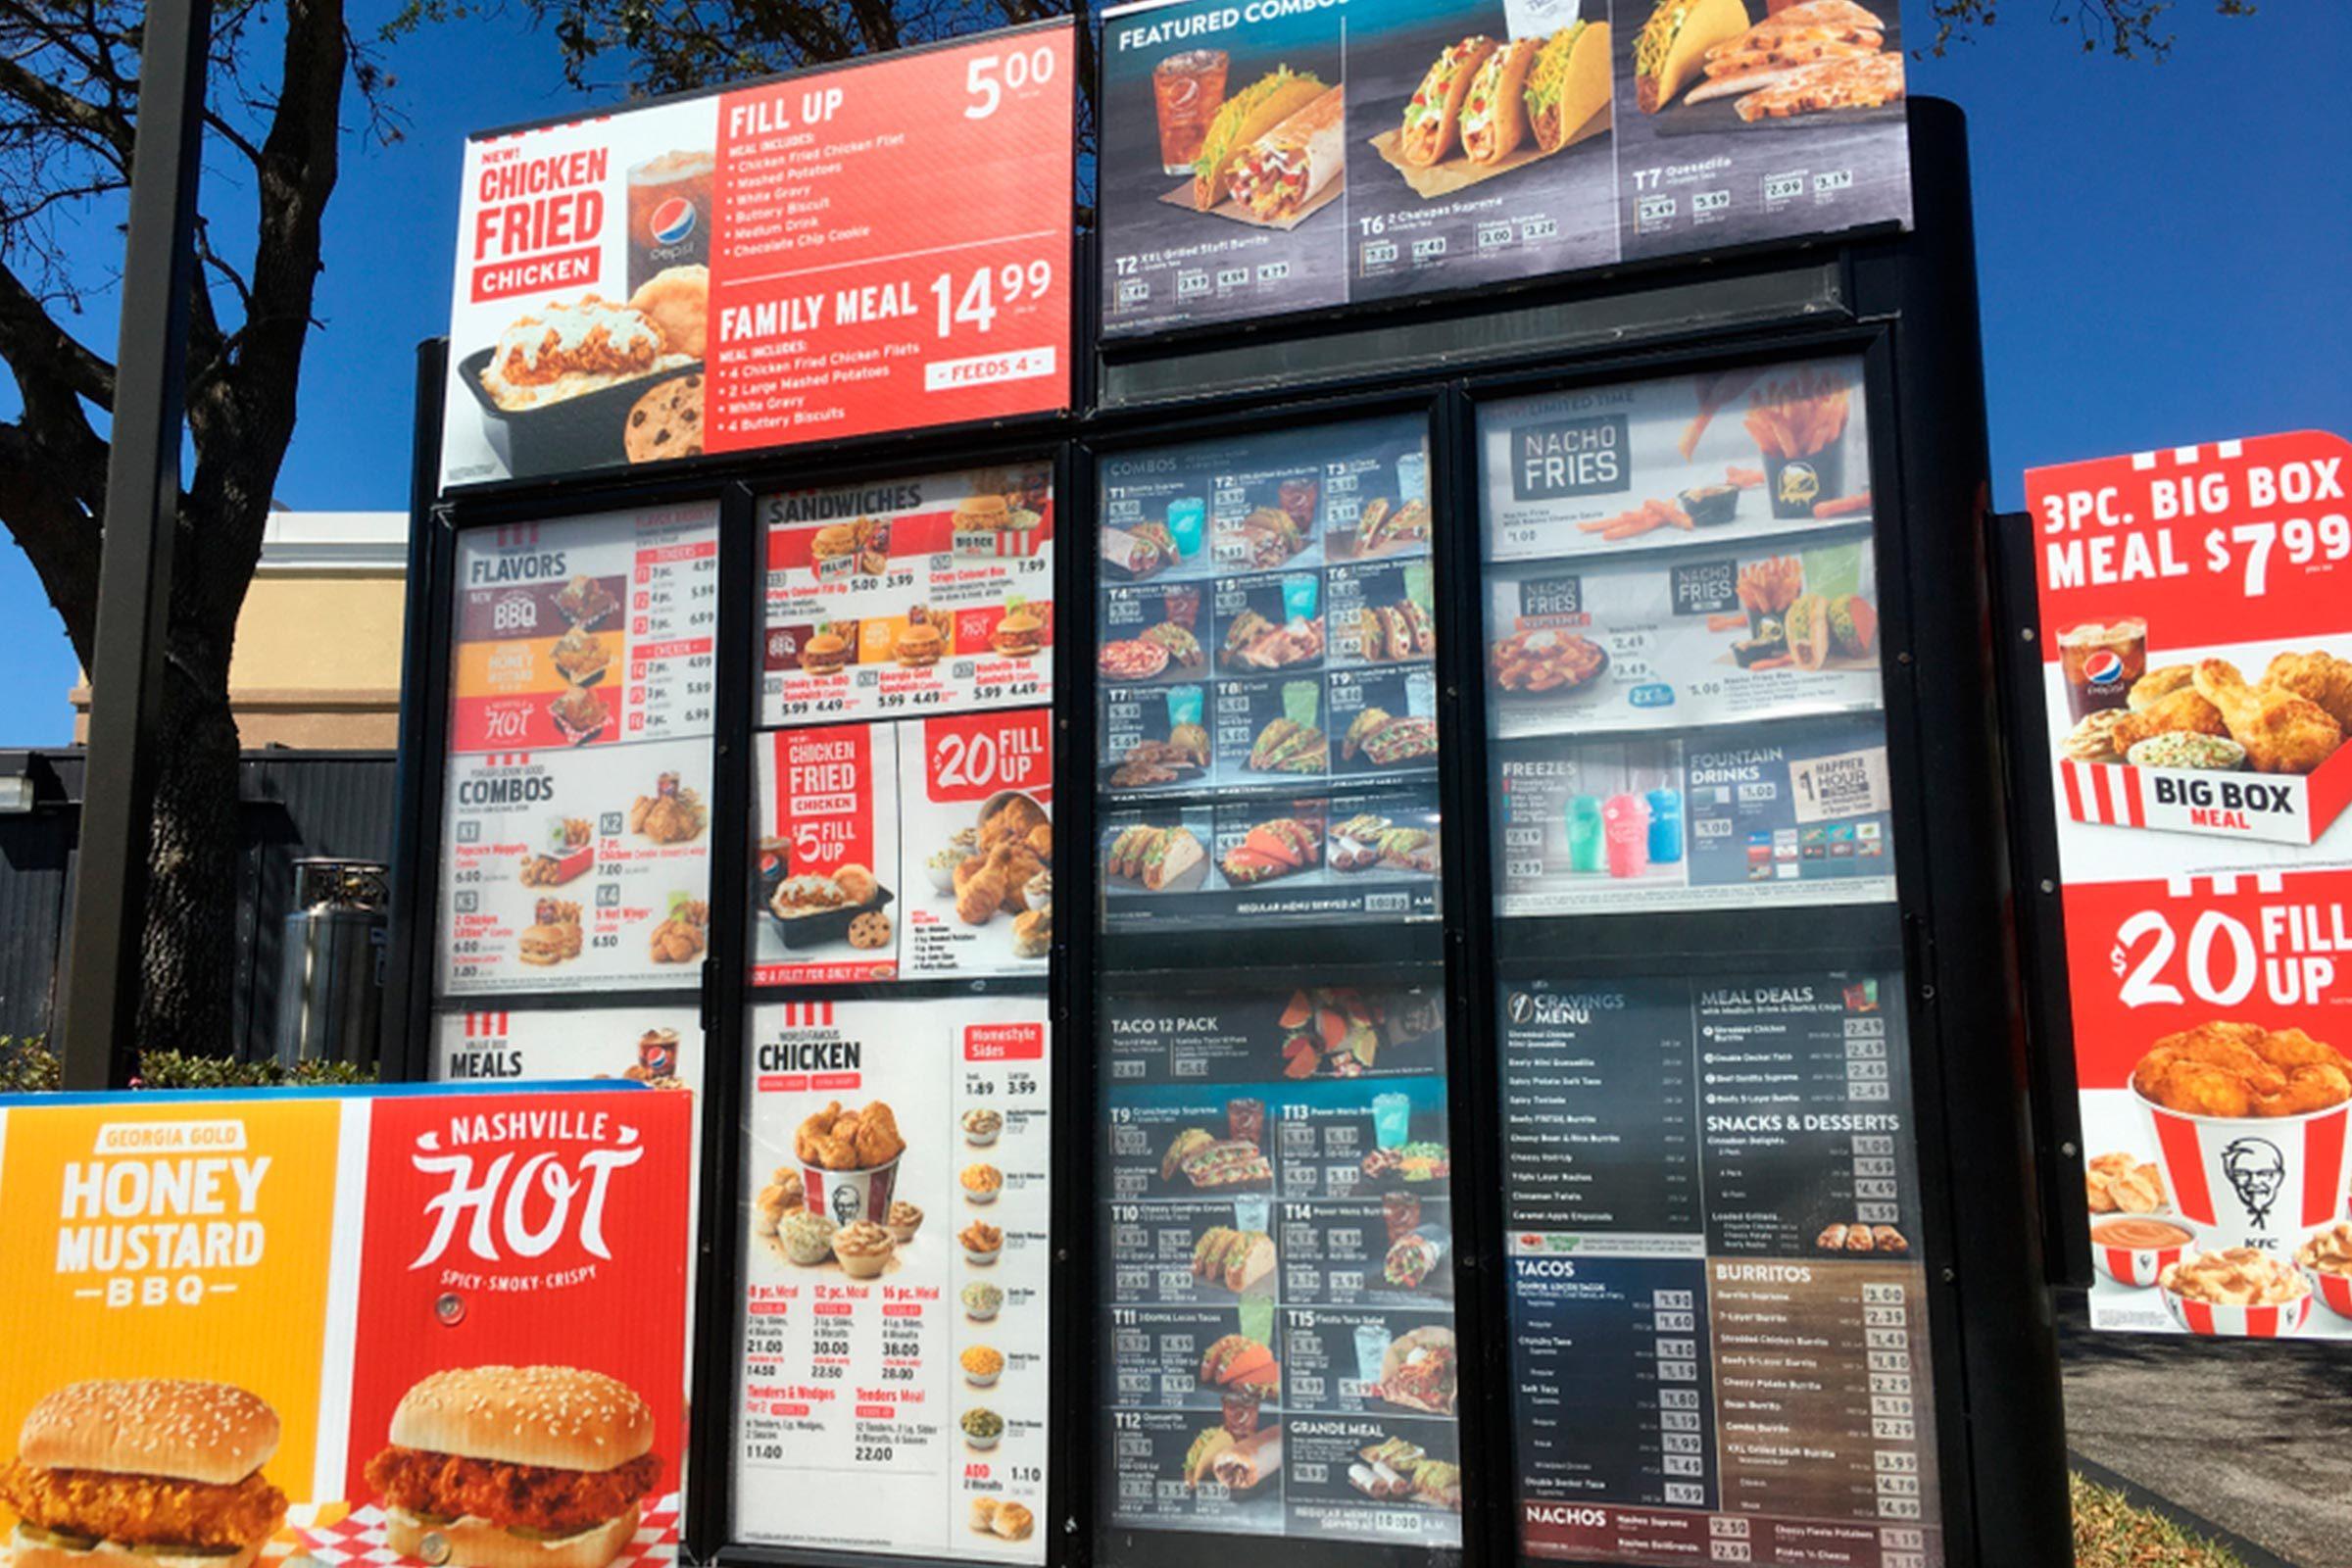 Taco bell and KFC drive thru menu